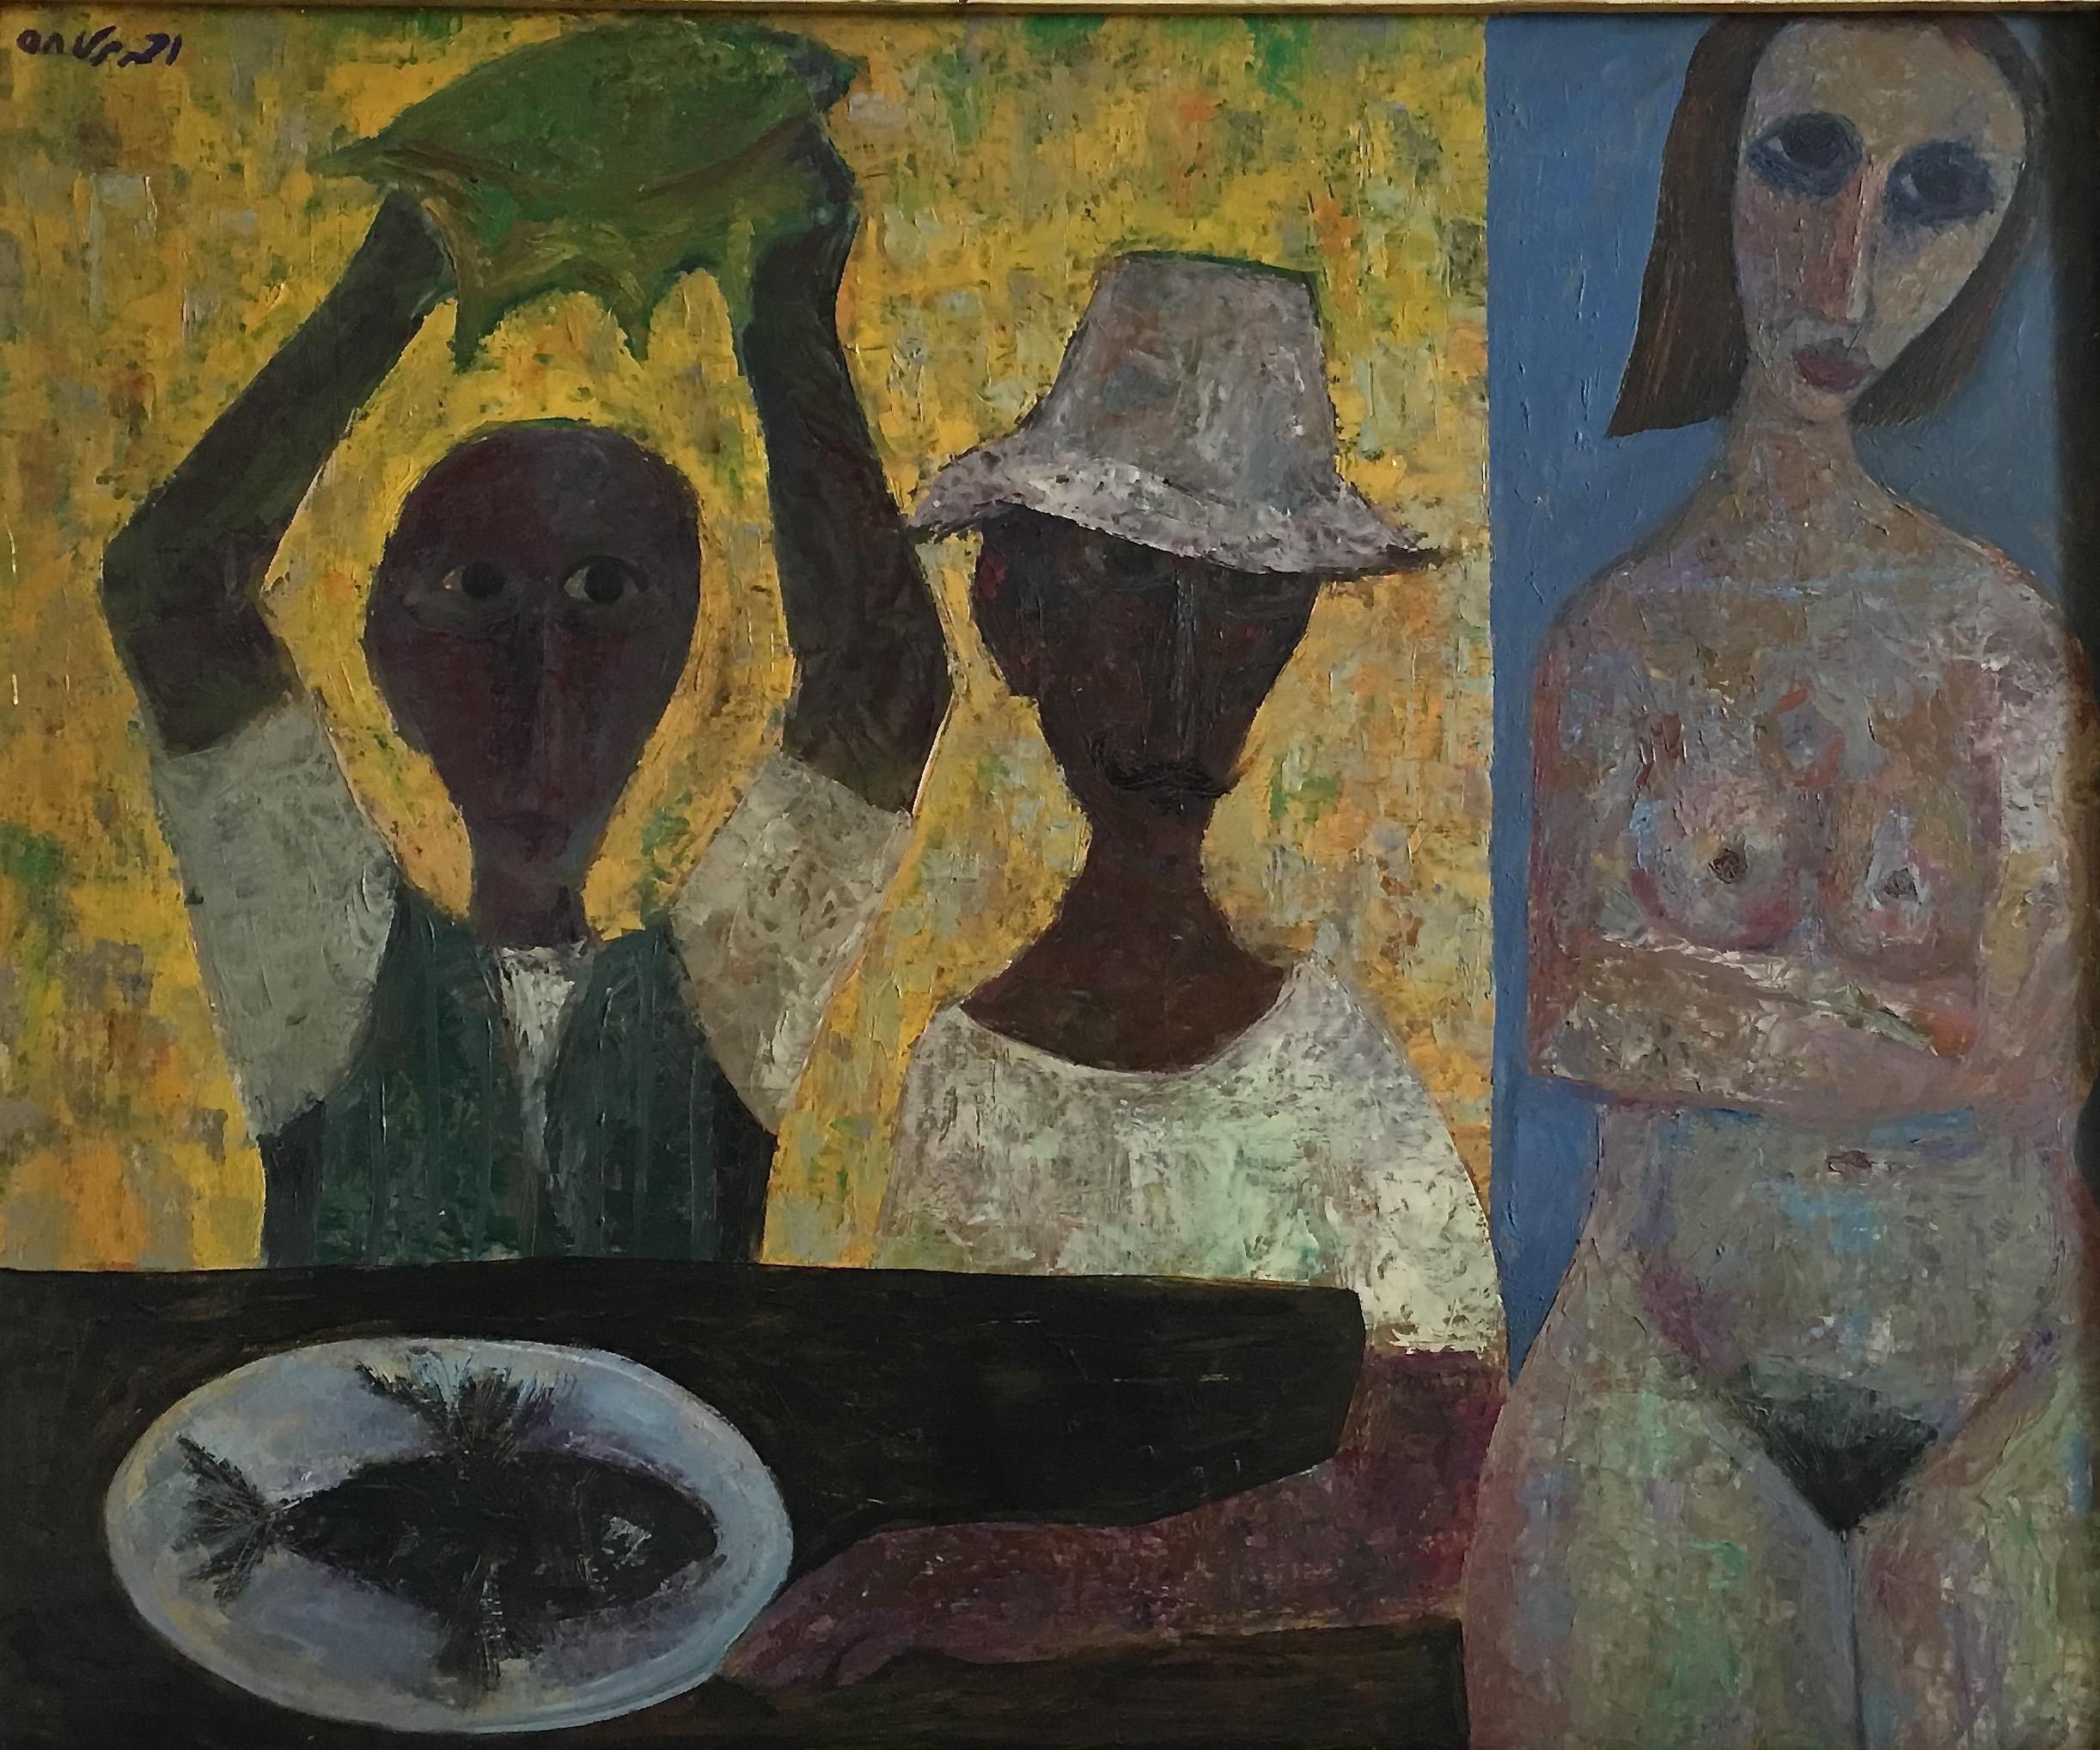 Ahmed-Morsi-Untitled-(Fishermen-Seashell-and-Nude)-Cairo-1958.jpg